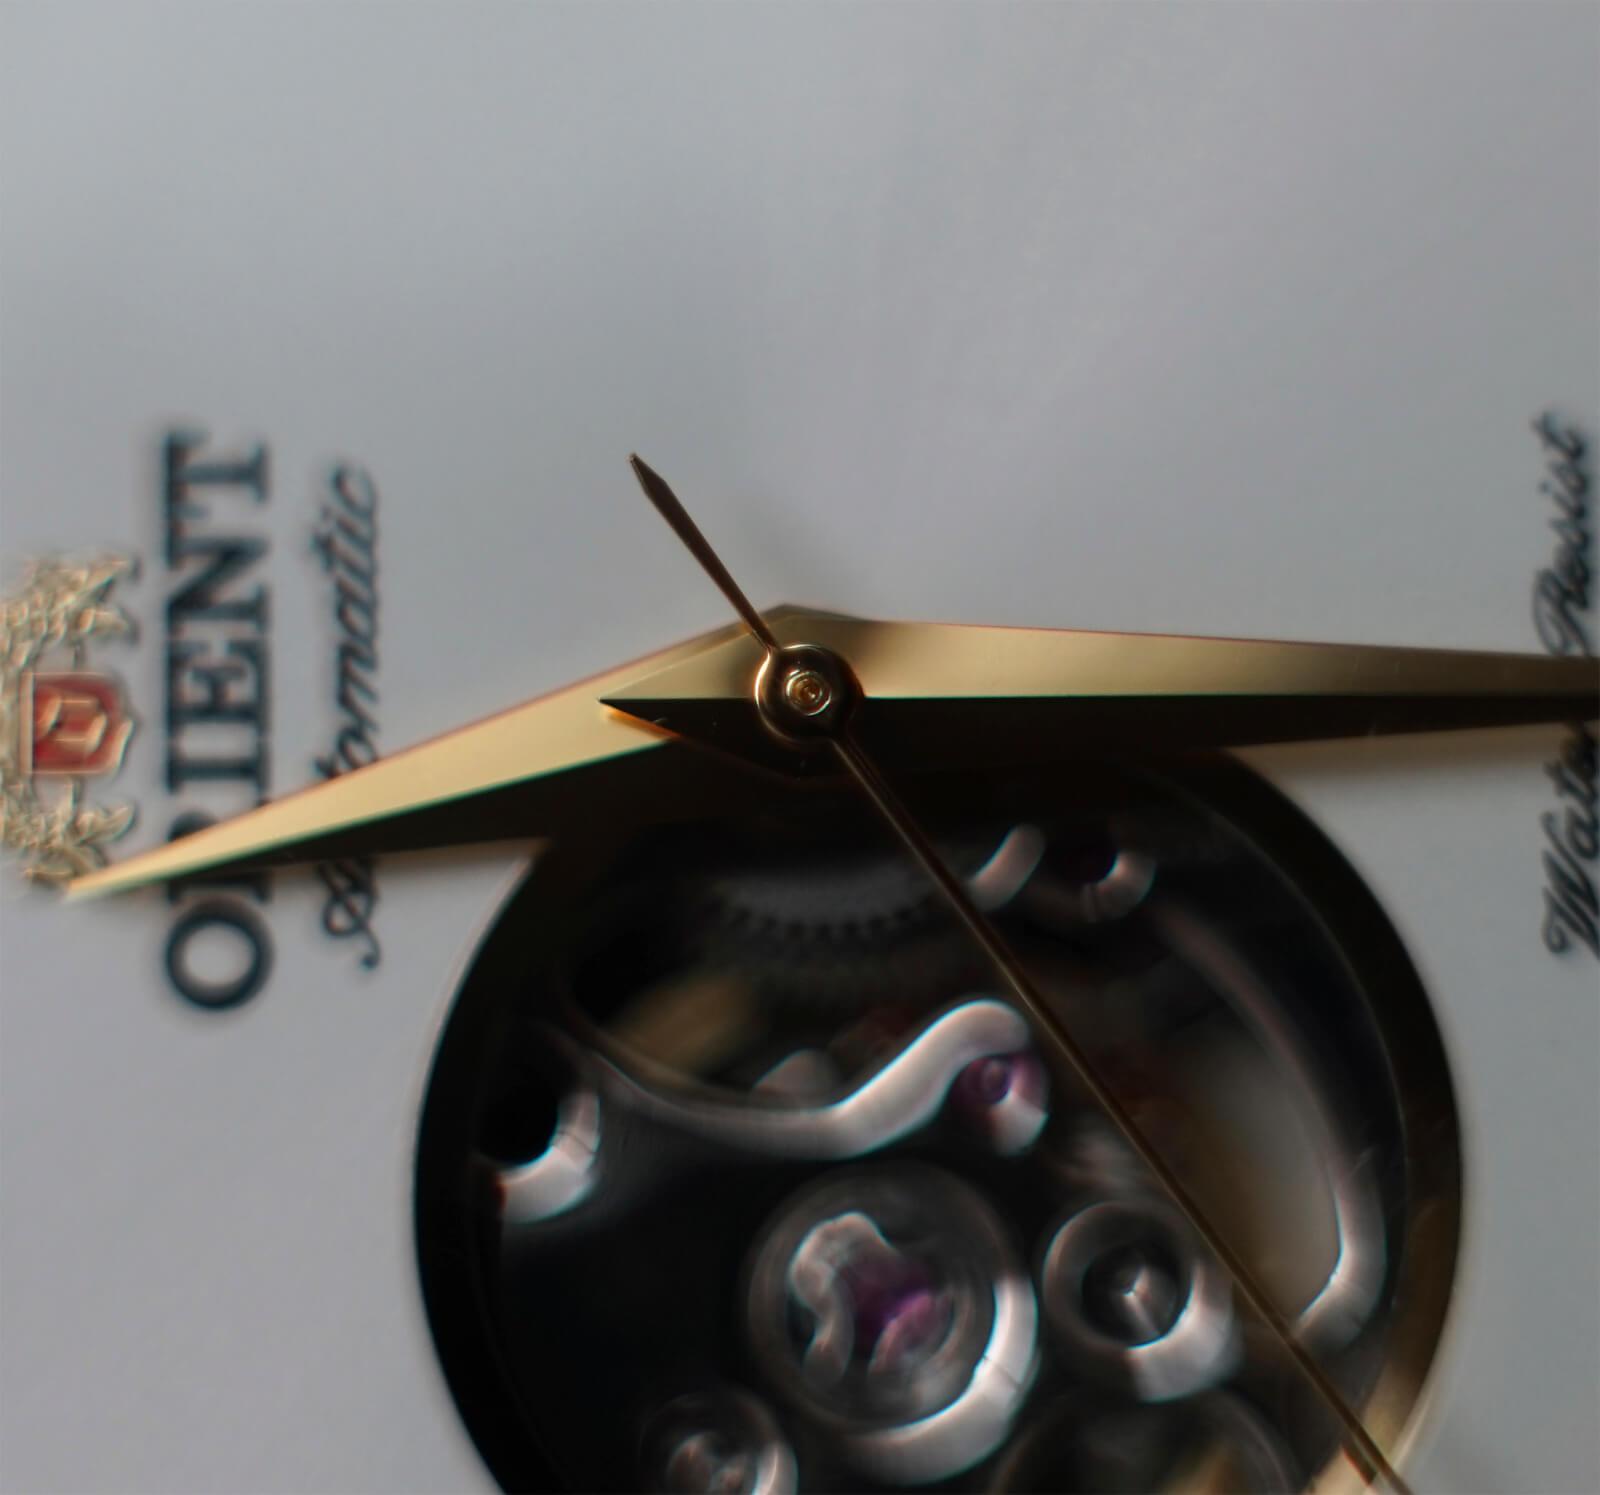 Orient Classic Automatic db08001w-16